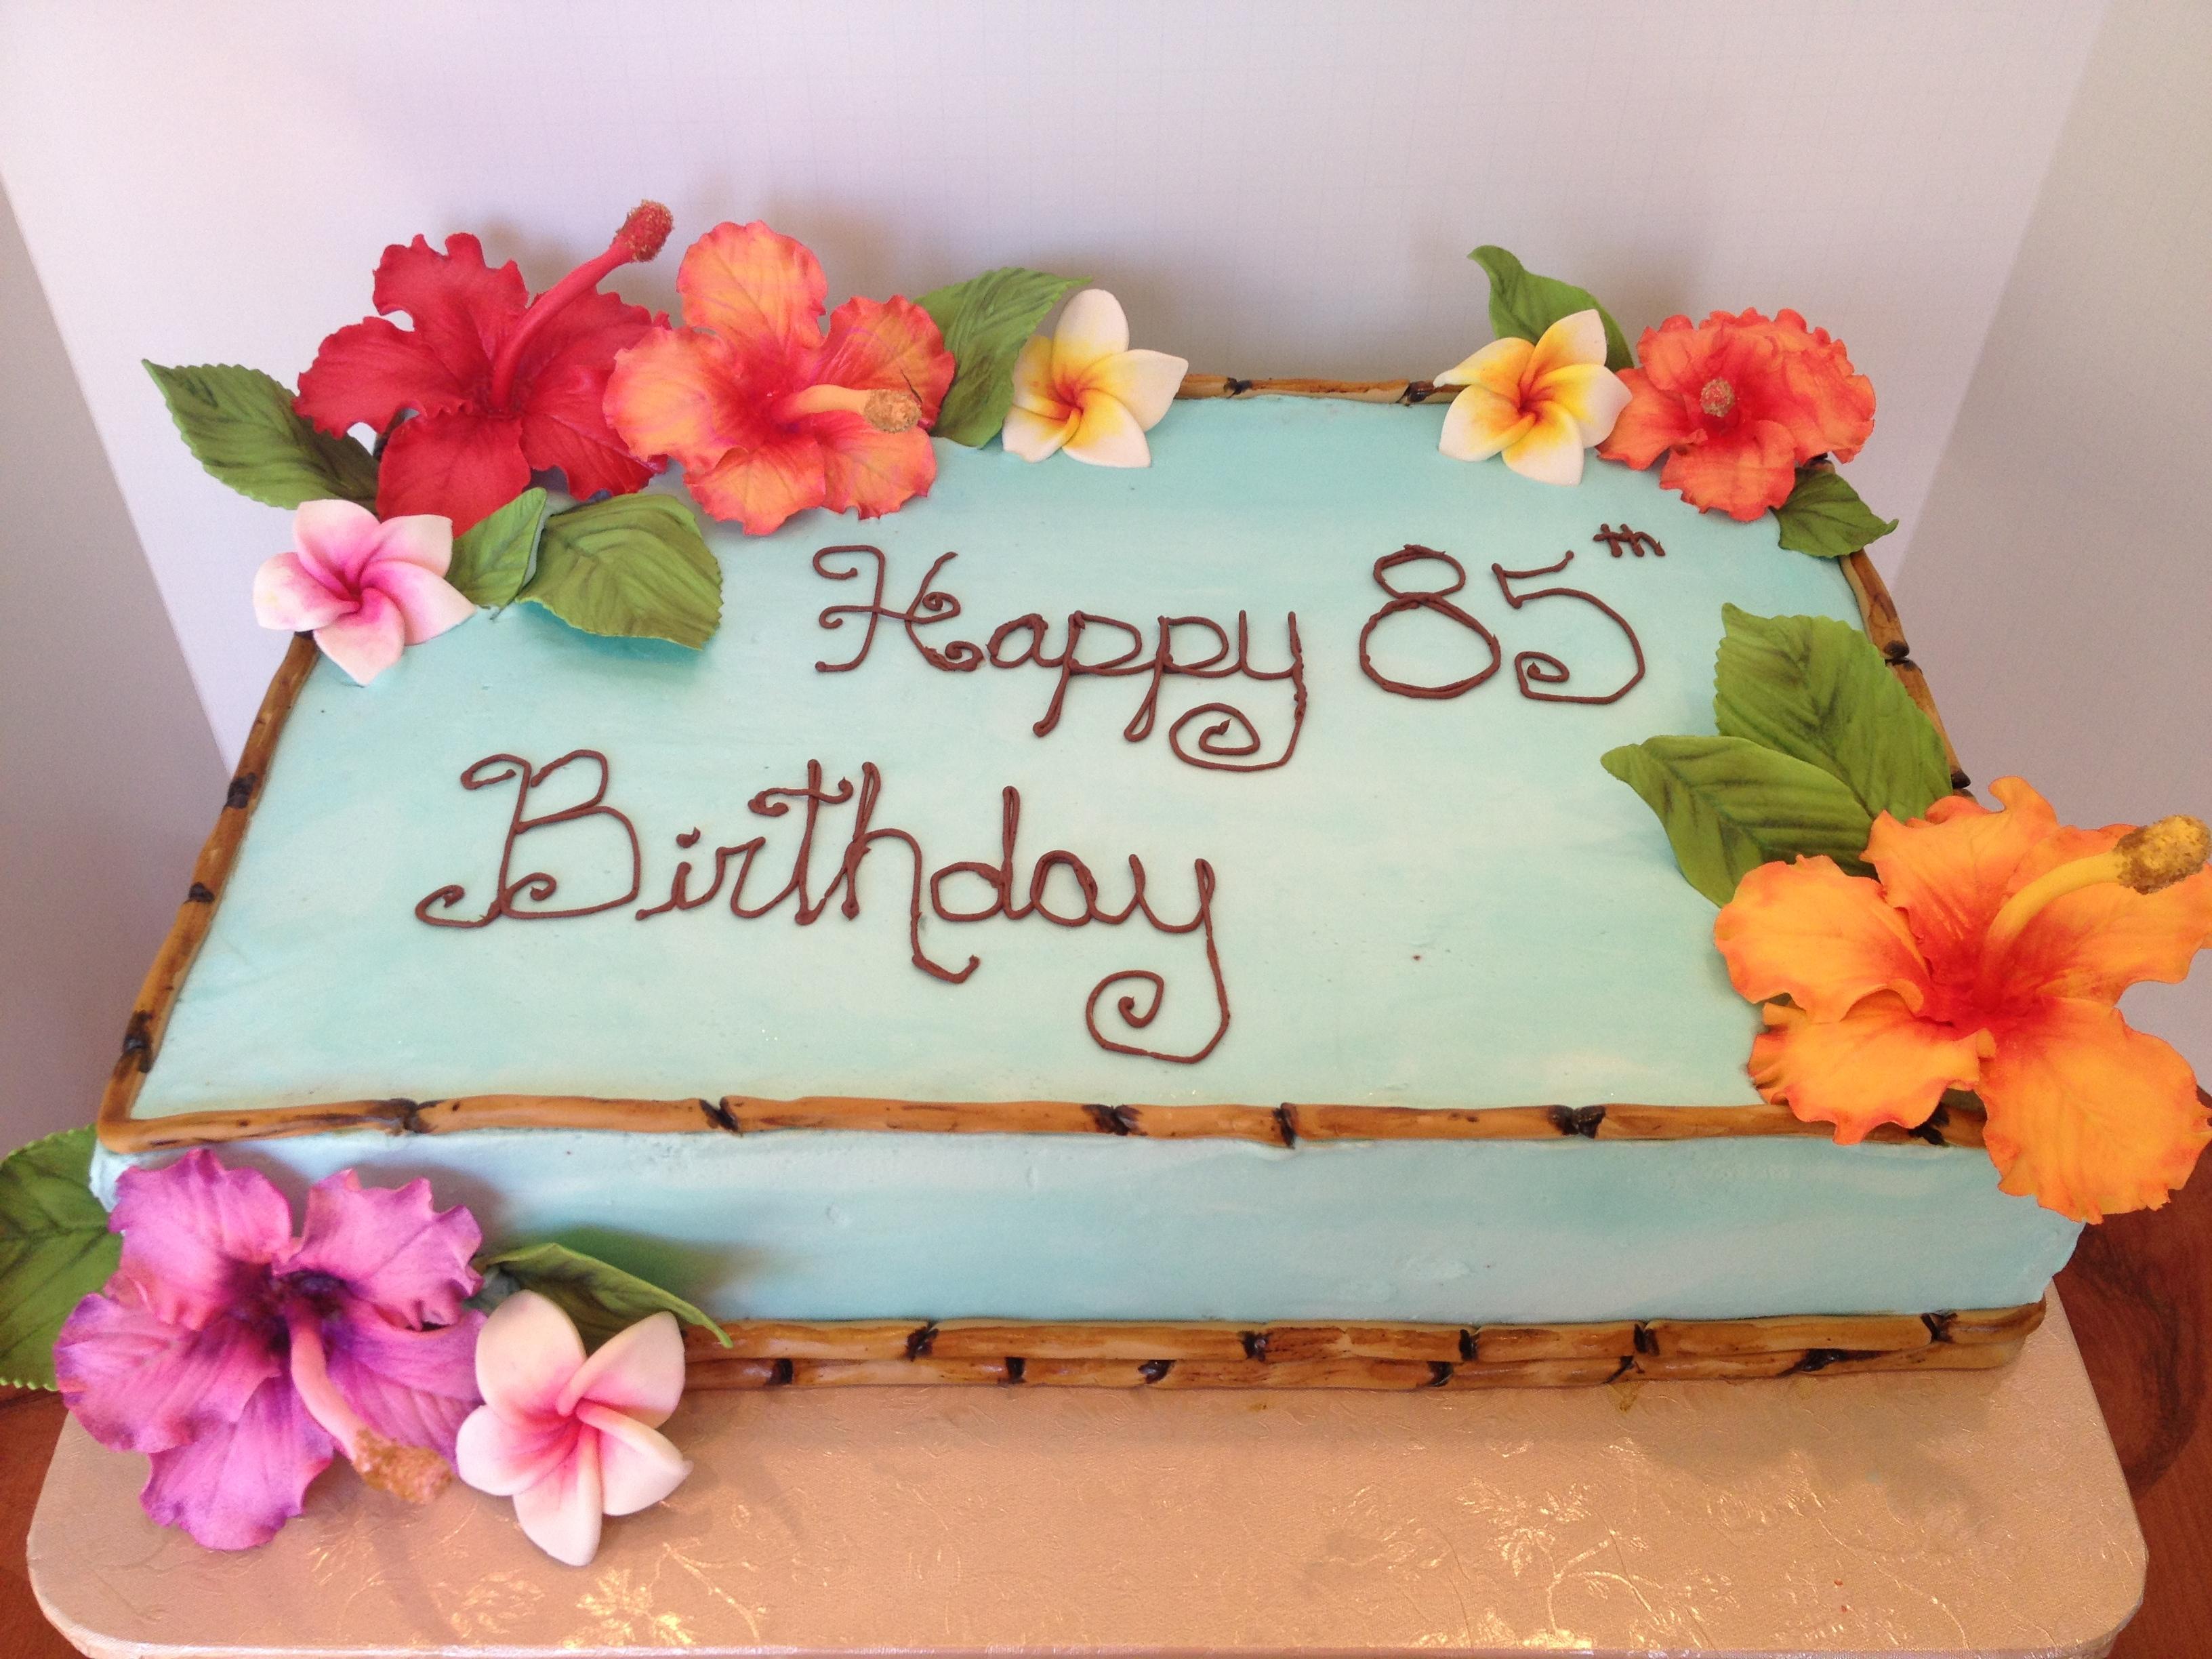 Tropics clipart birthday cake #15